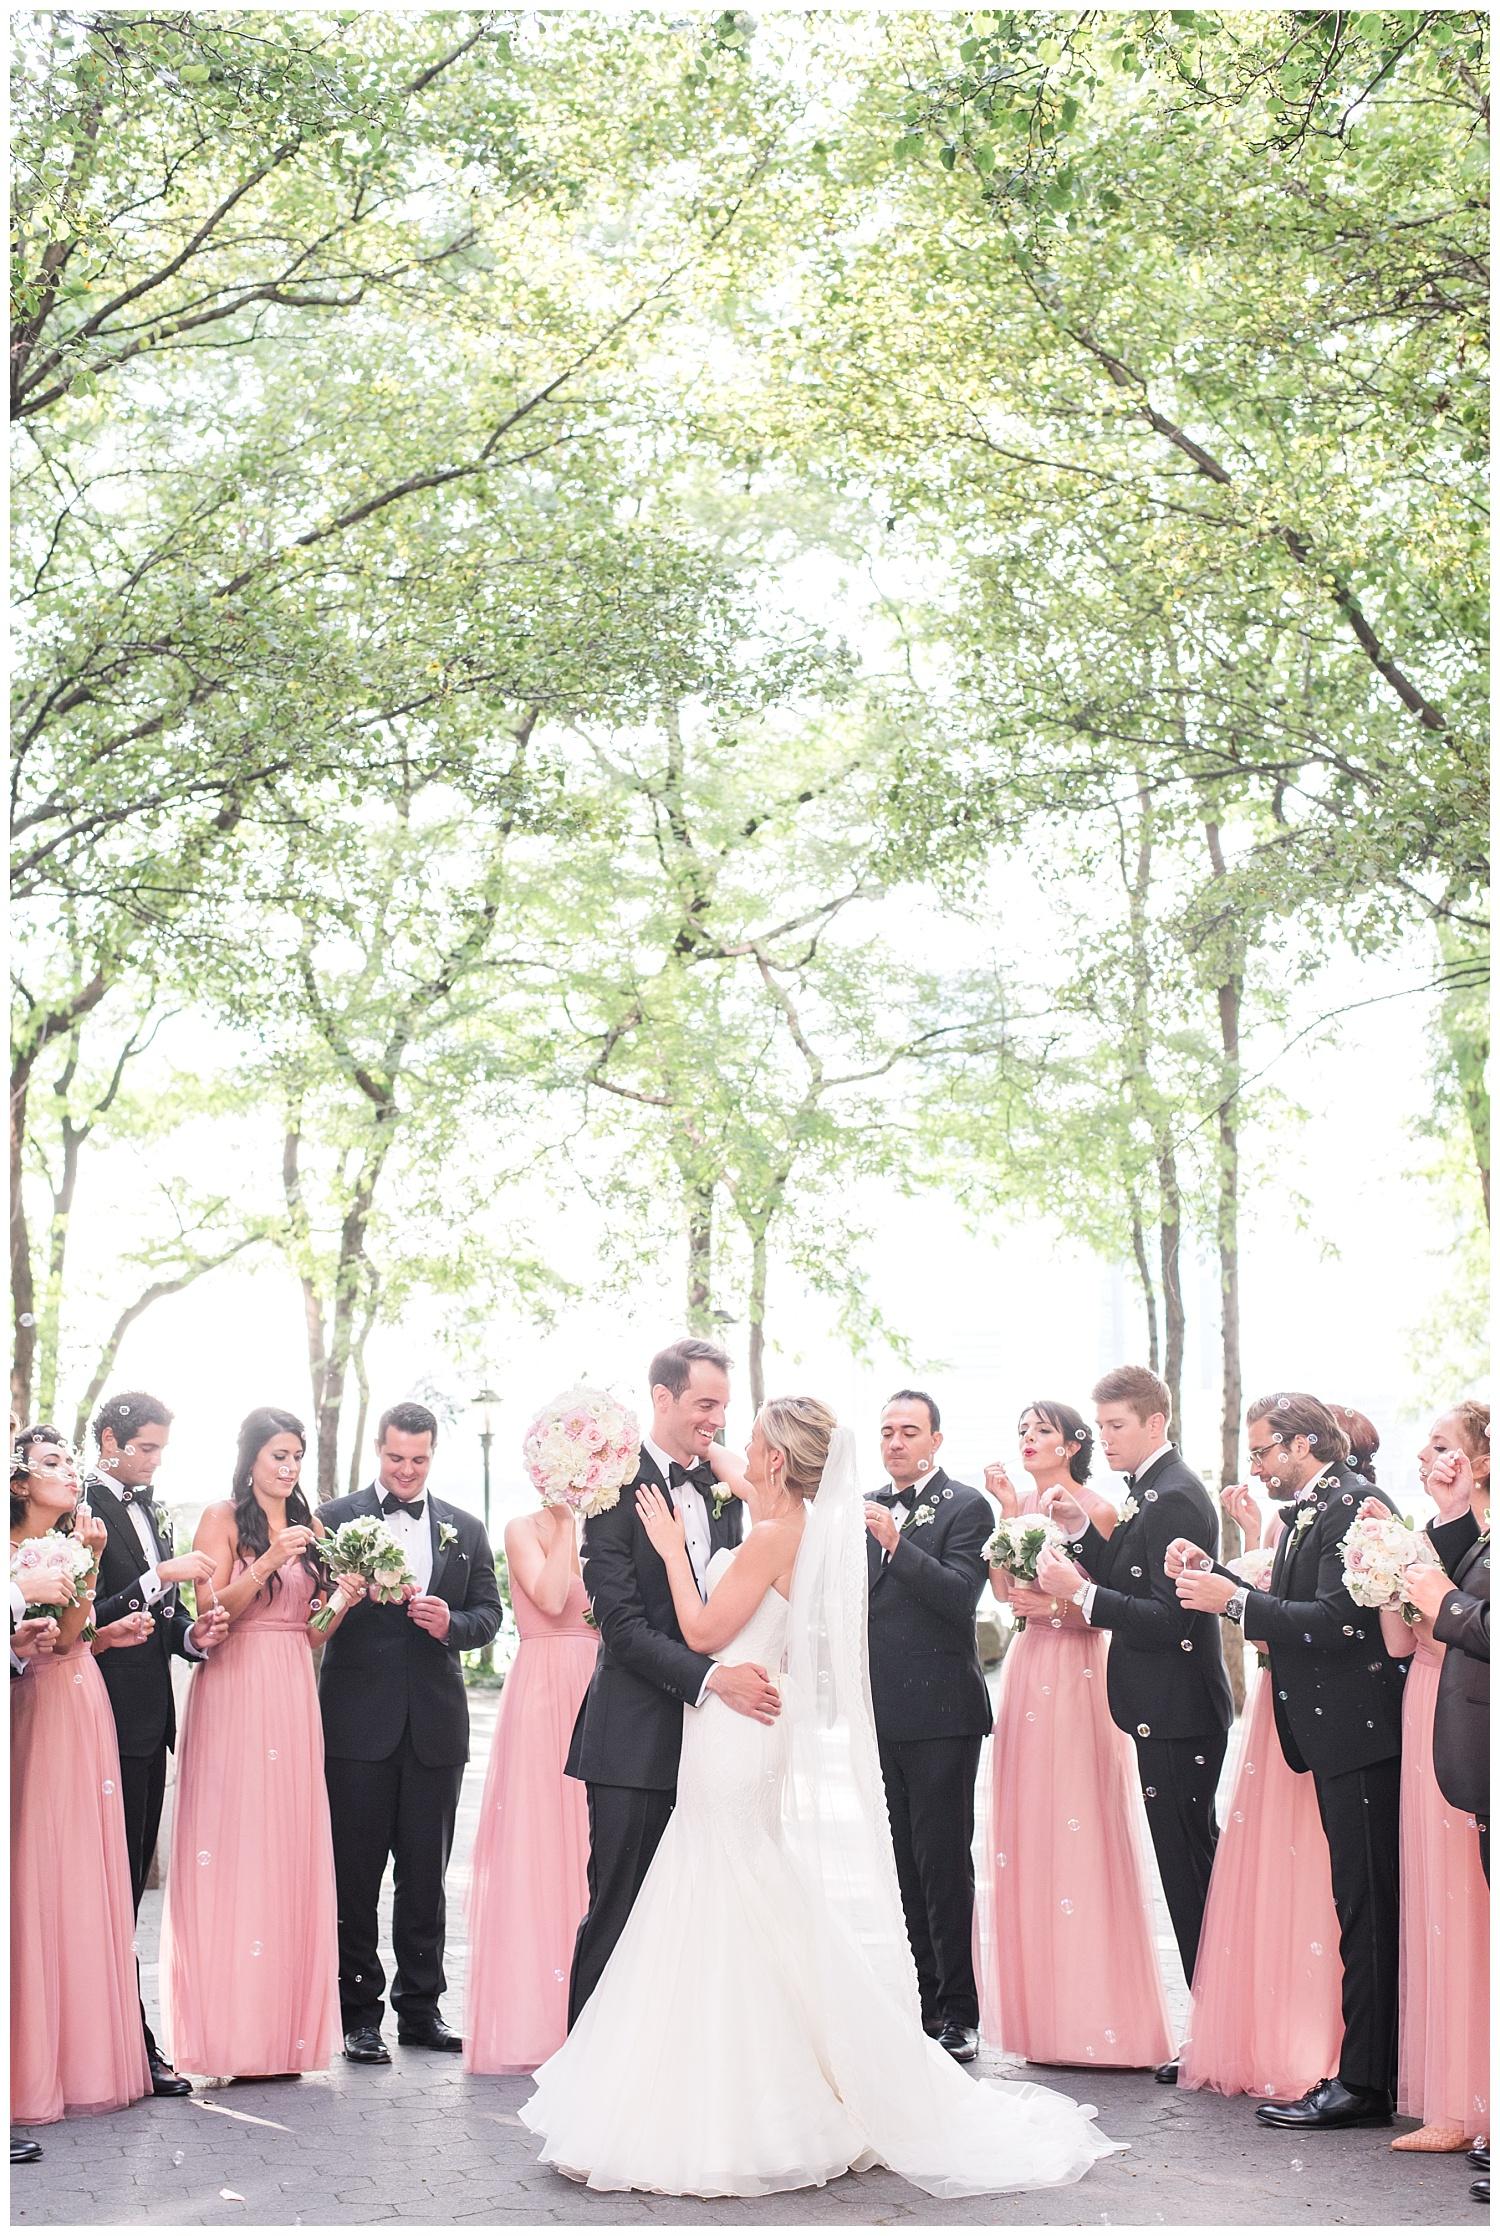 Chelsea_Piers_Lighthouse_Wedding_Fabiana_Skubic_Photography (22).jpg